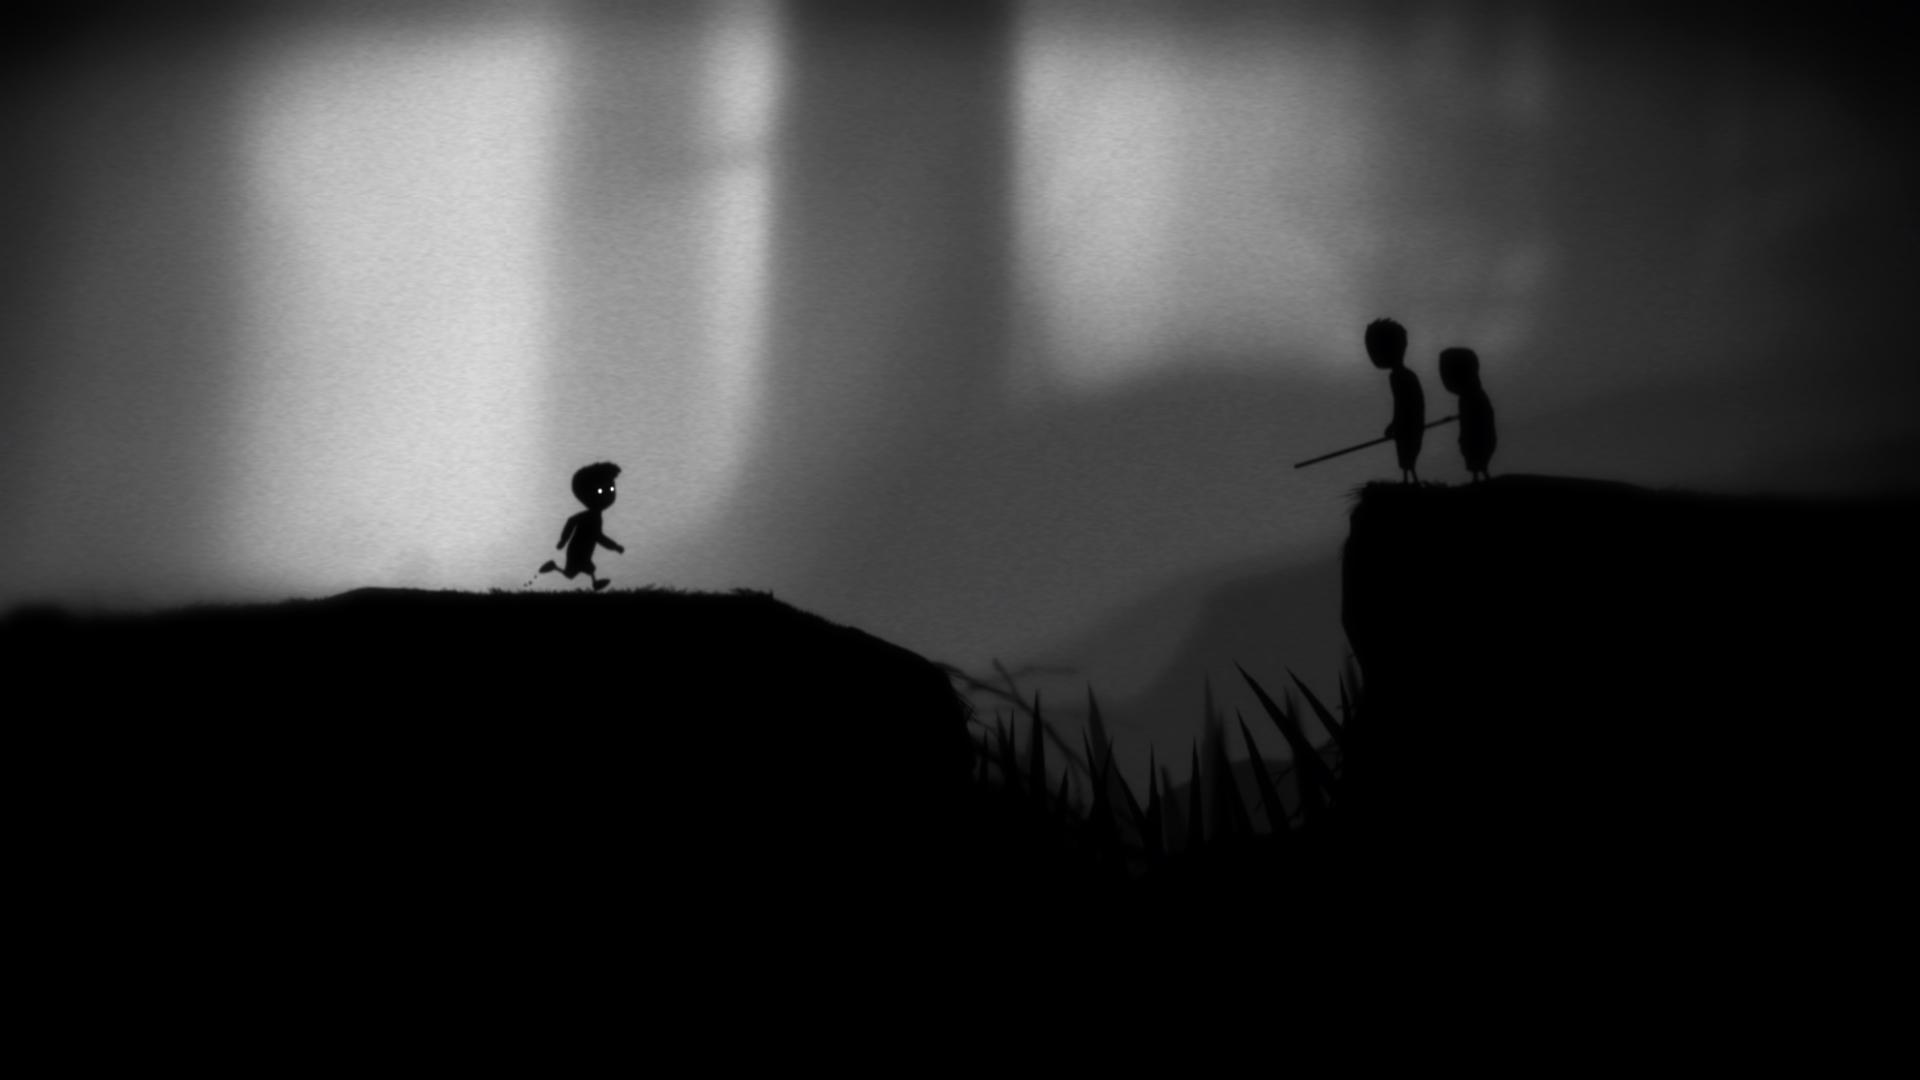 Playdead - Shacknews.com - Video Game News, Trailers, Game ...